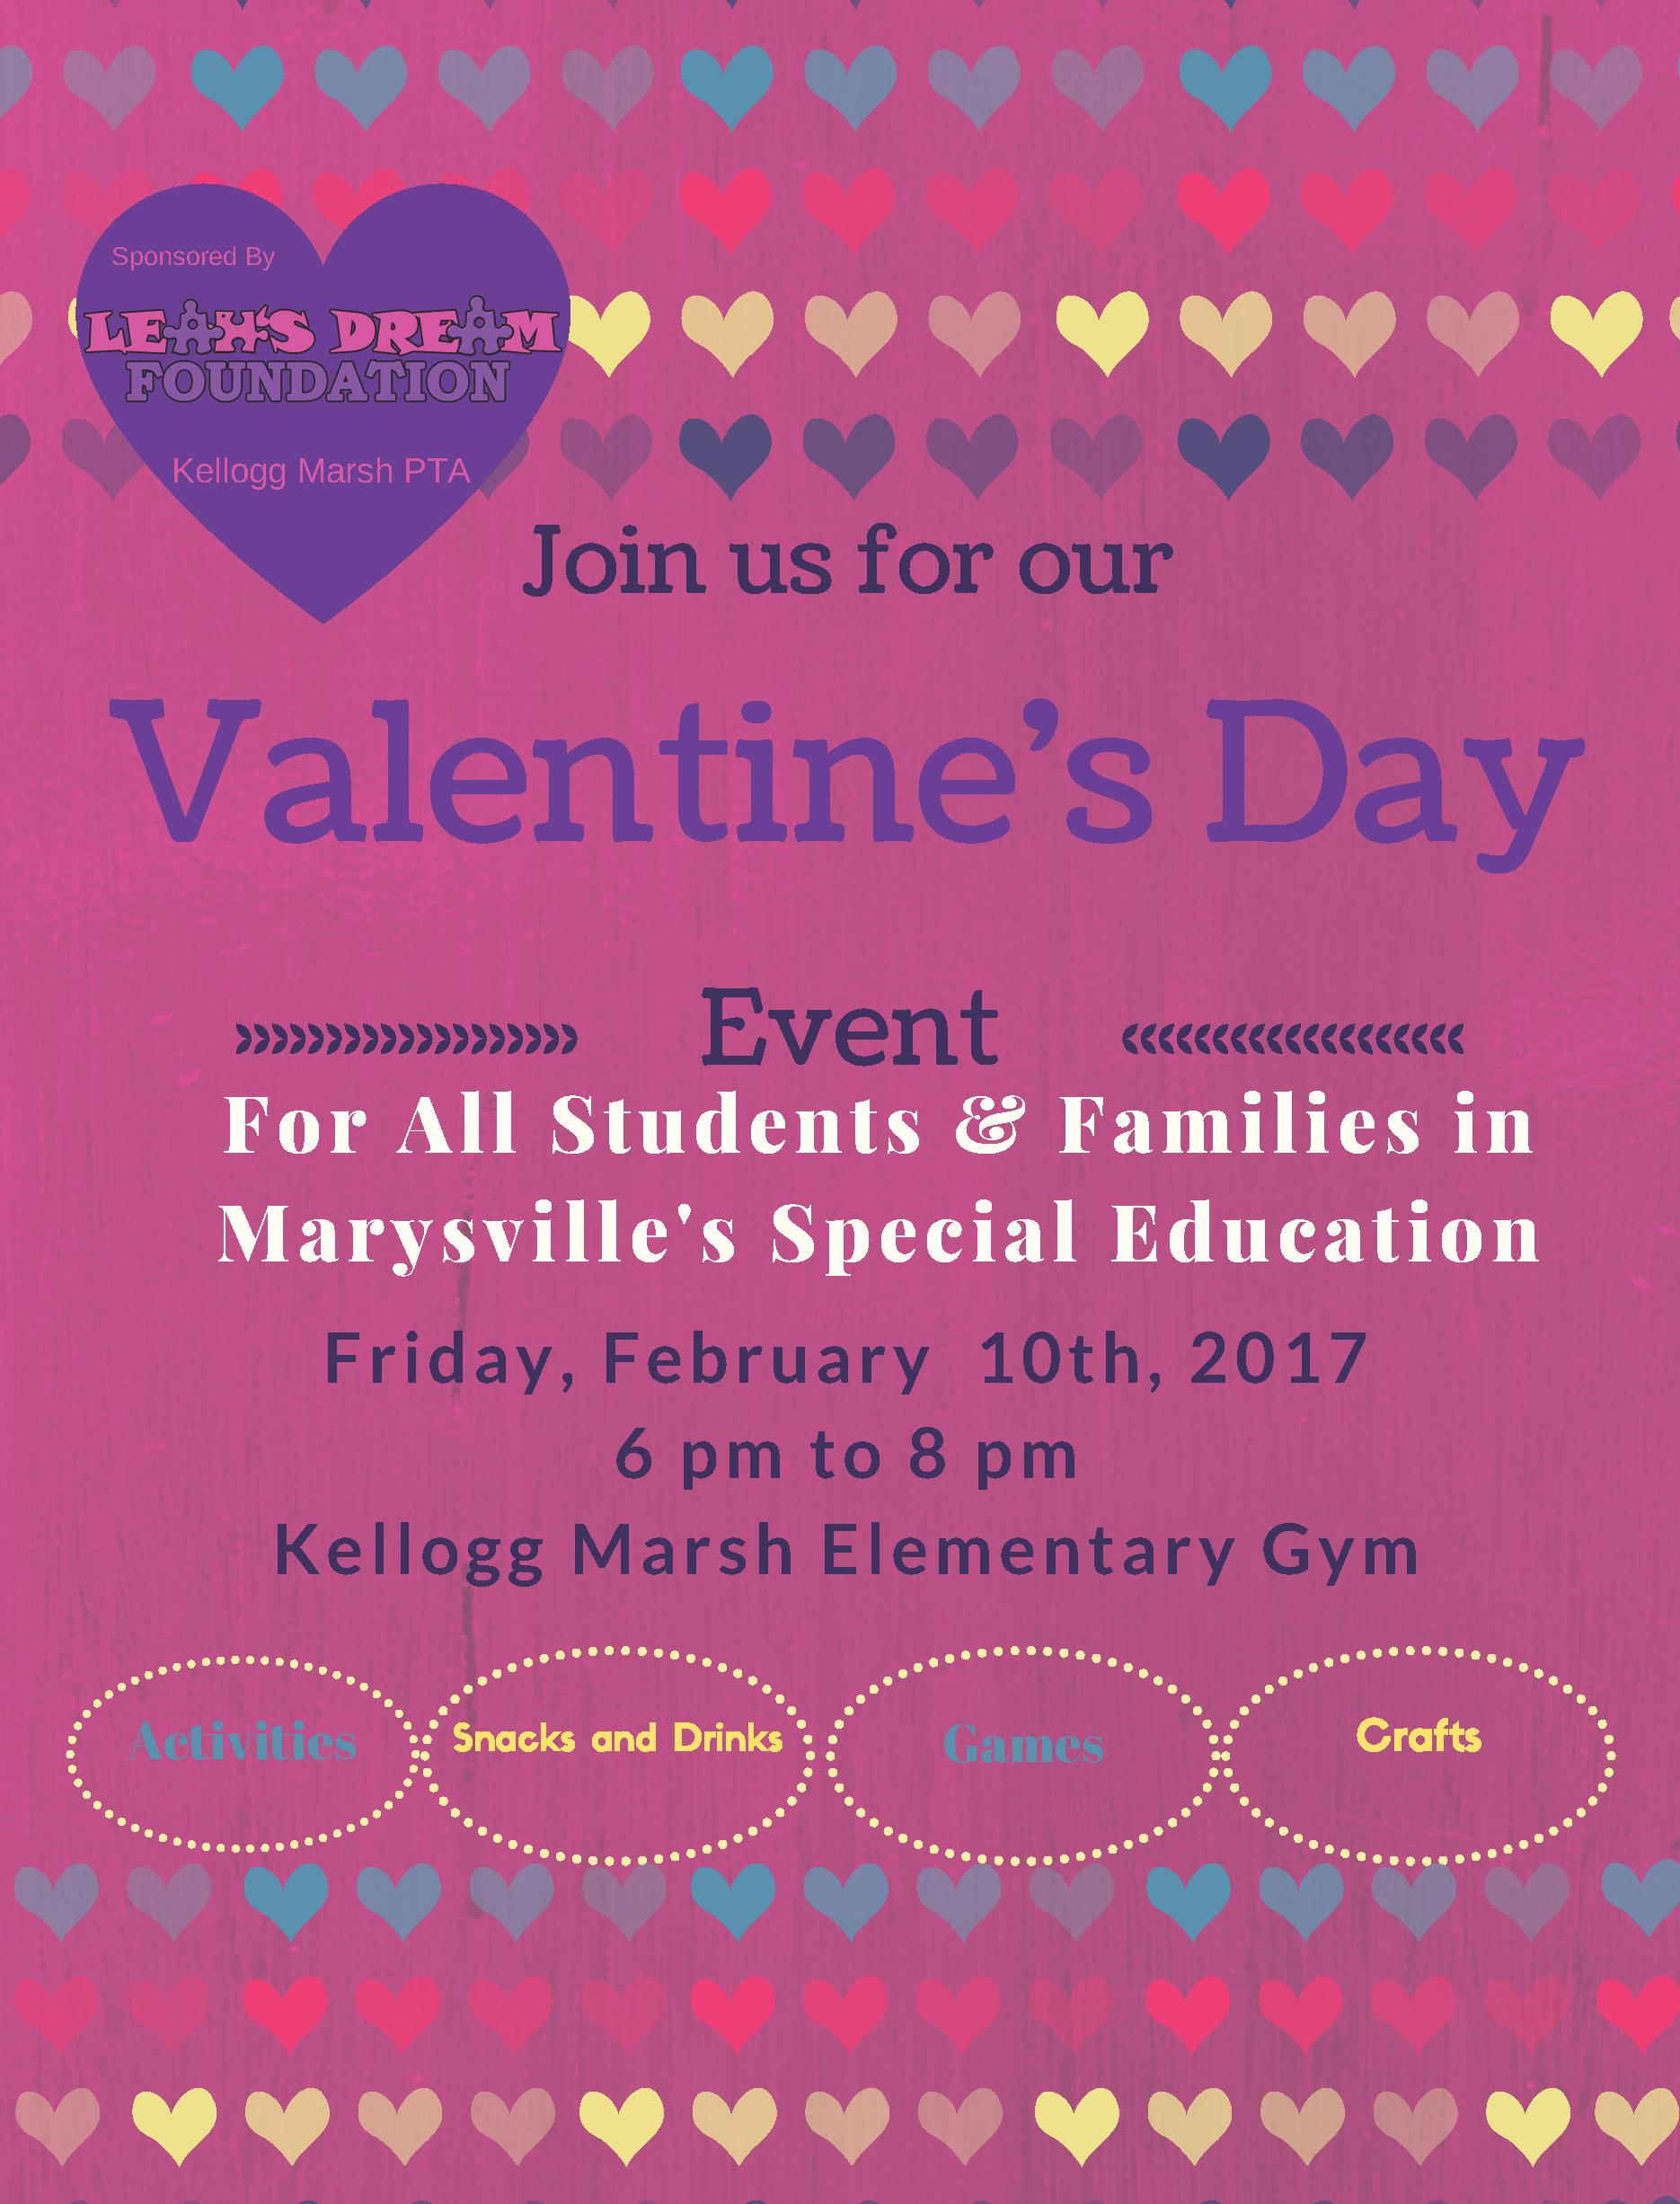 2017 Valentine's Day Event